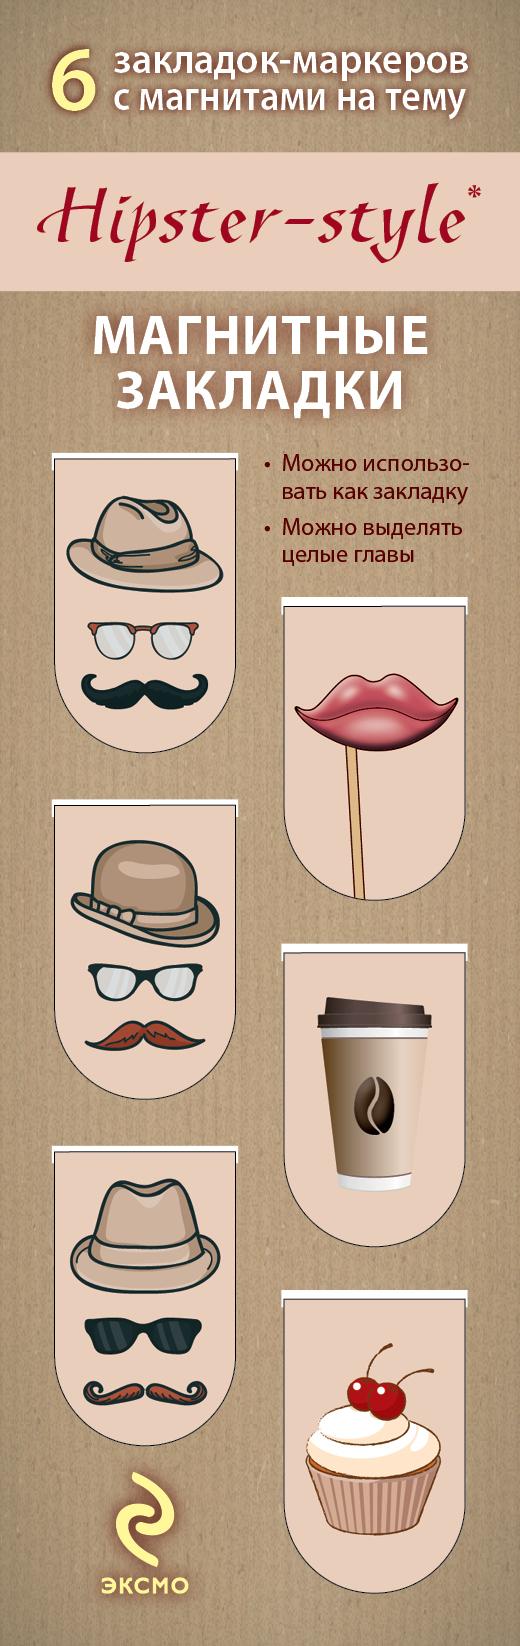 Магнитные закладки. Hipster-style (6 закладок полукругл.)